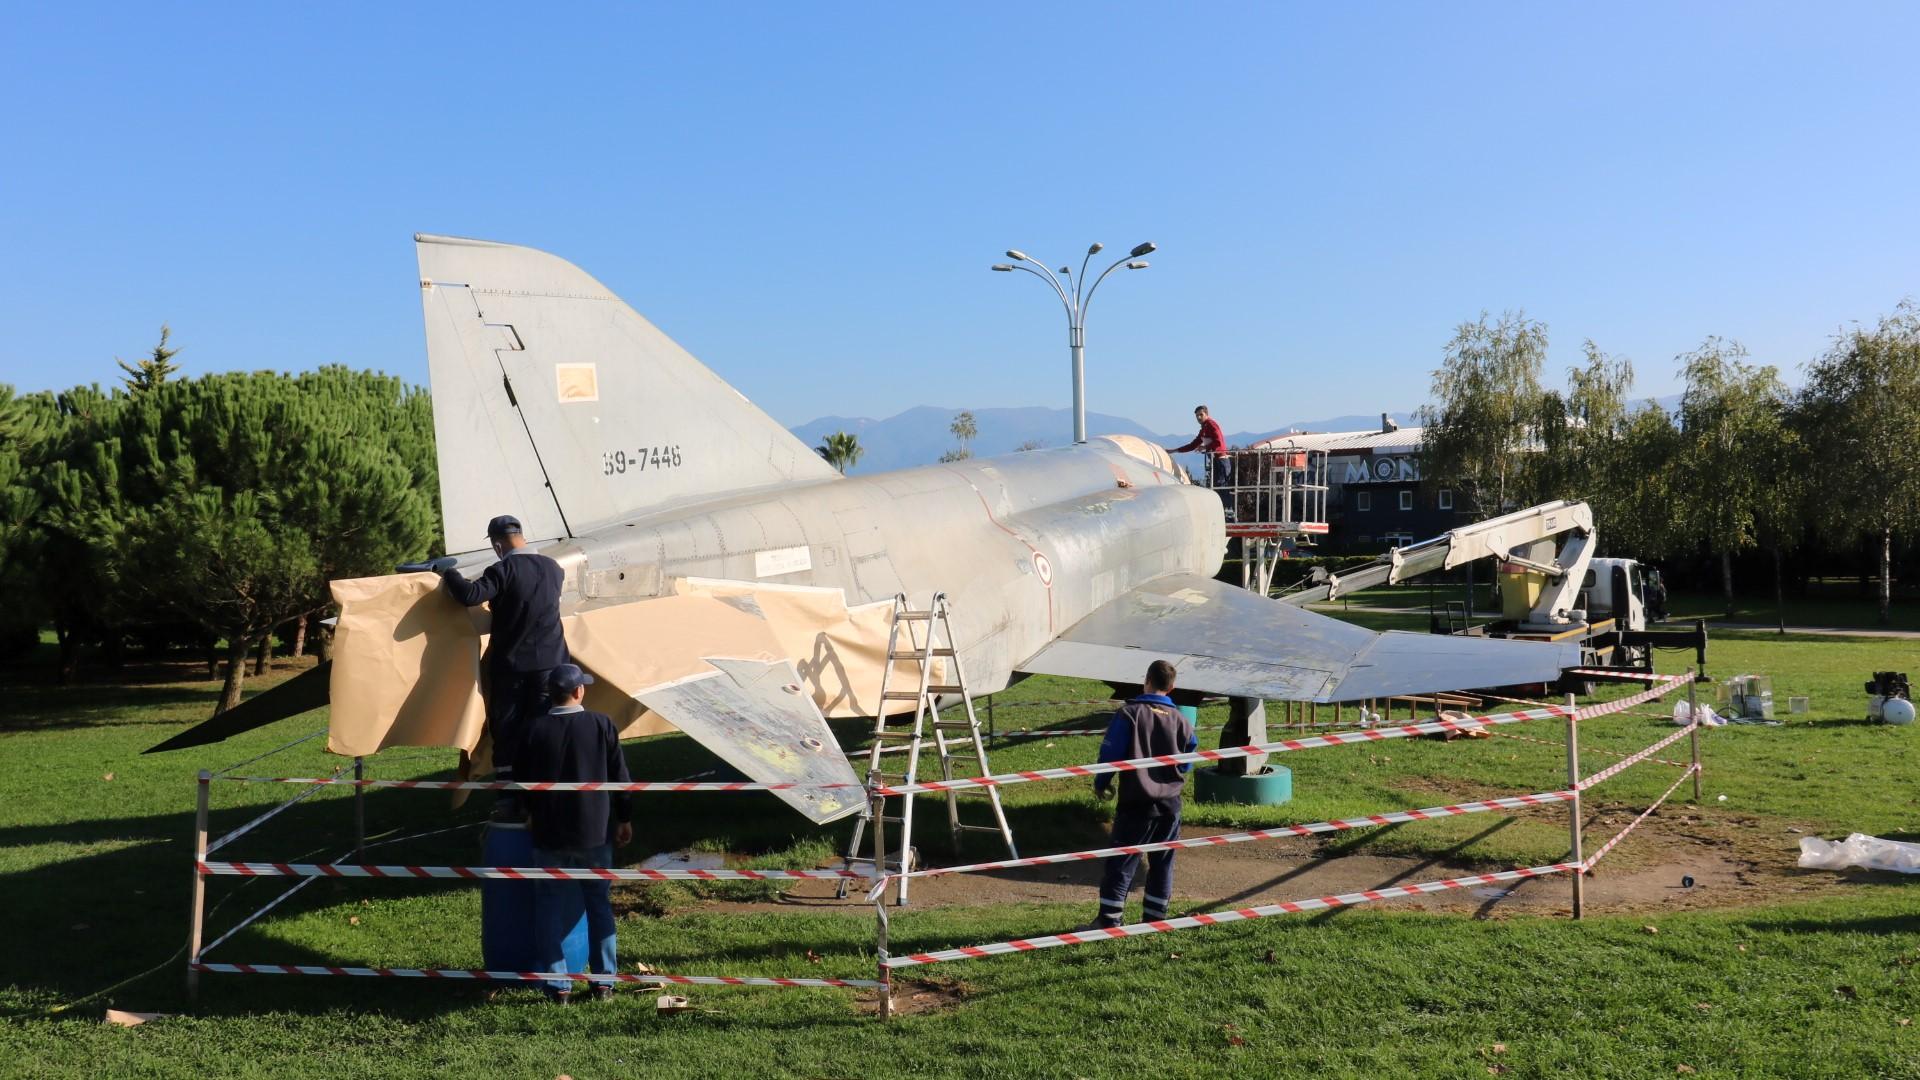 İzmit Seka Park'ta F4 uçağı var